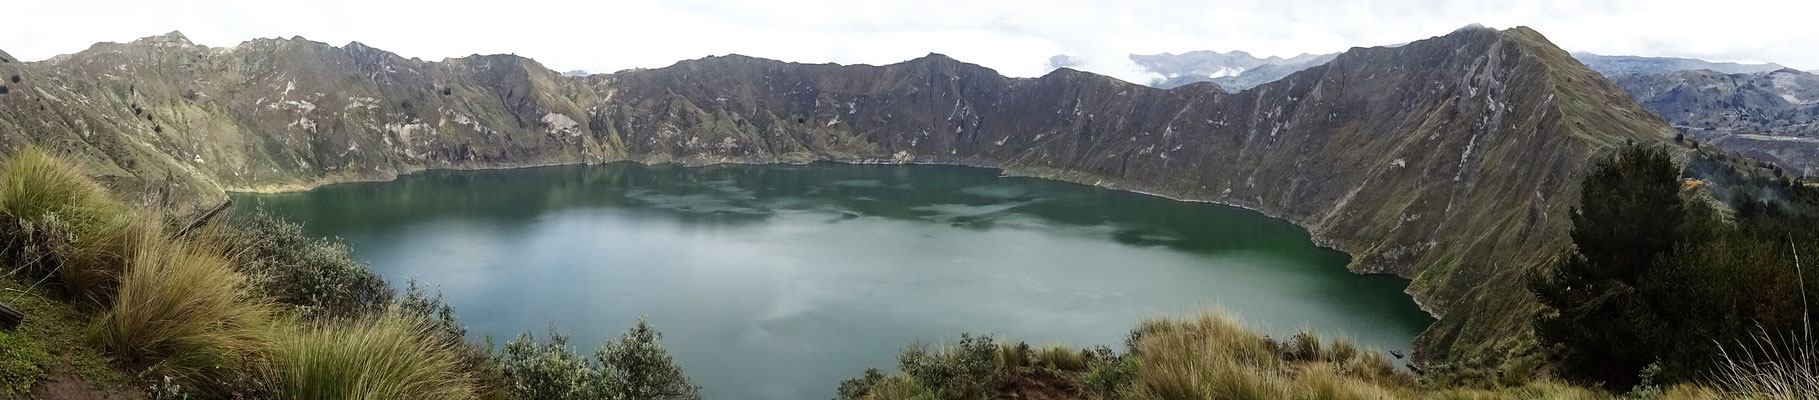 Laguna Quilotoa - den Anblick kann man nur als Panoramafoto festhalten